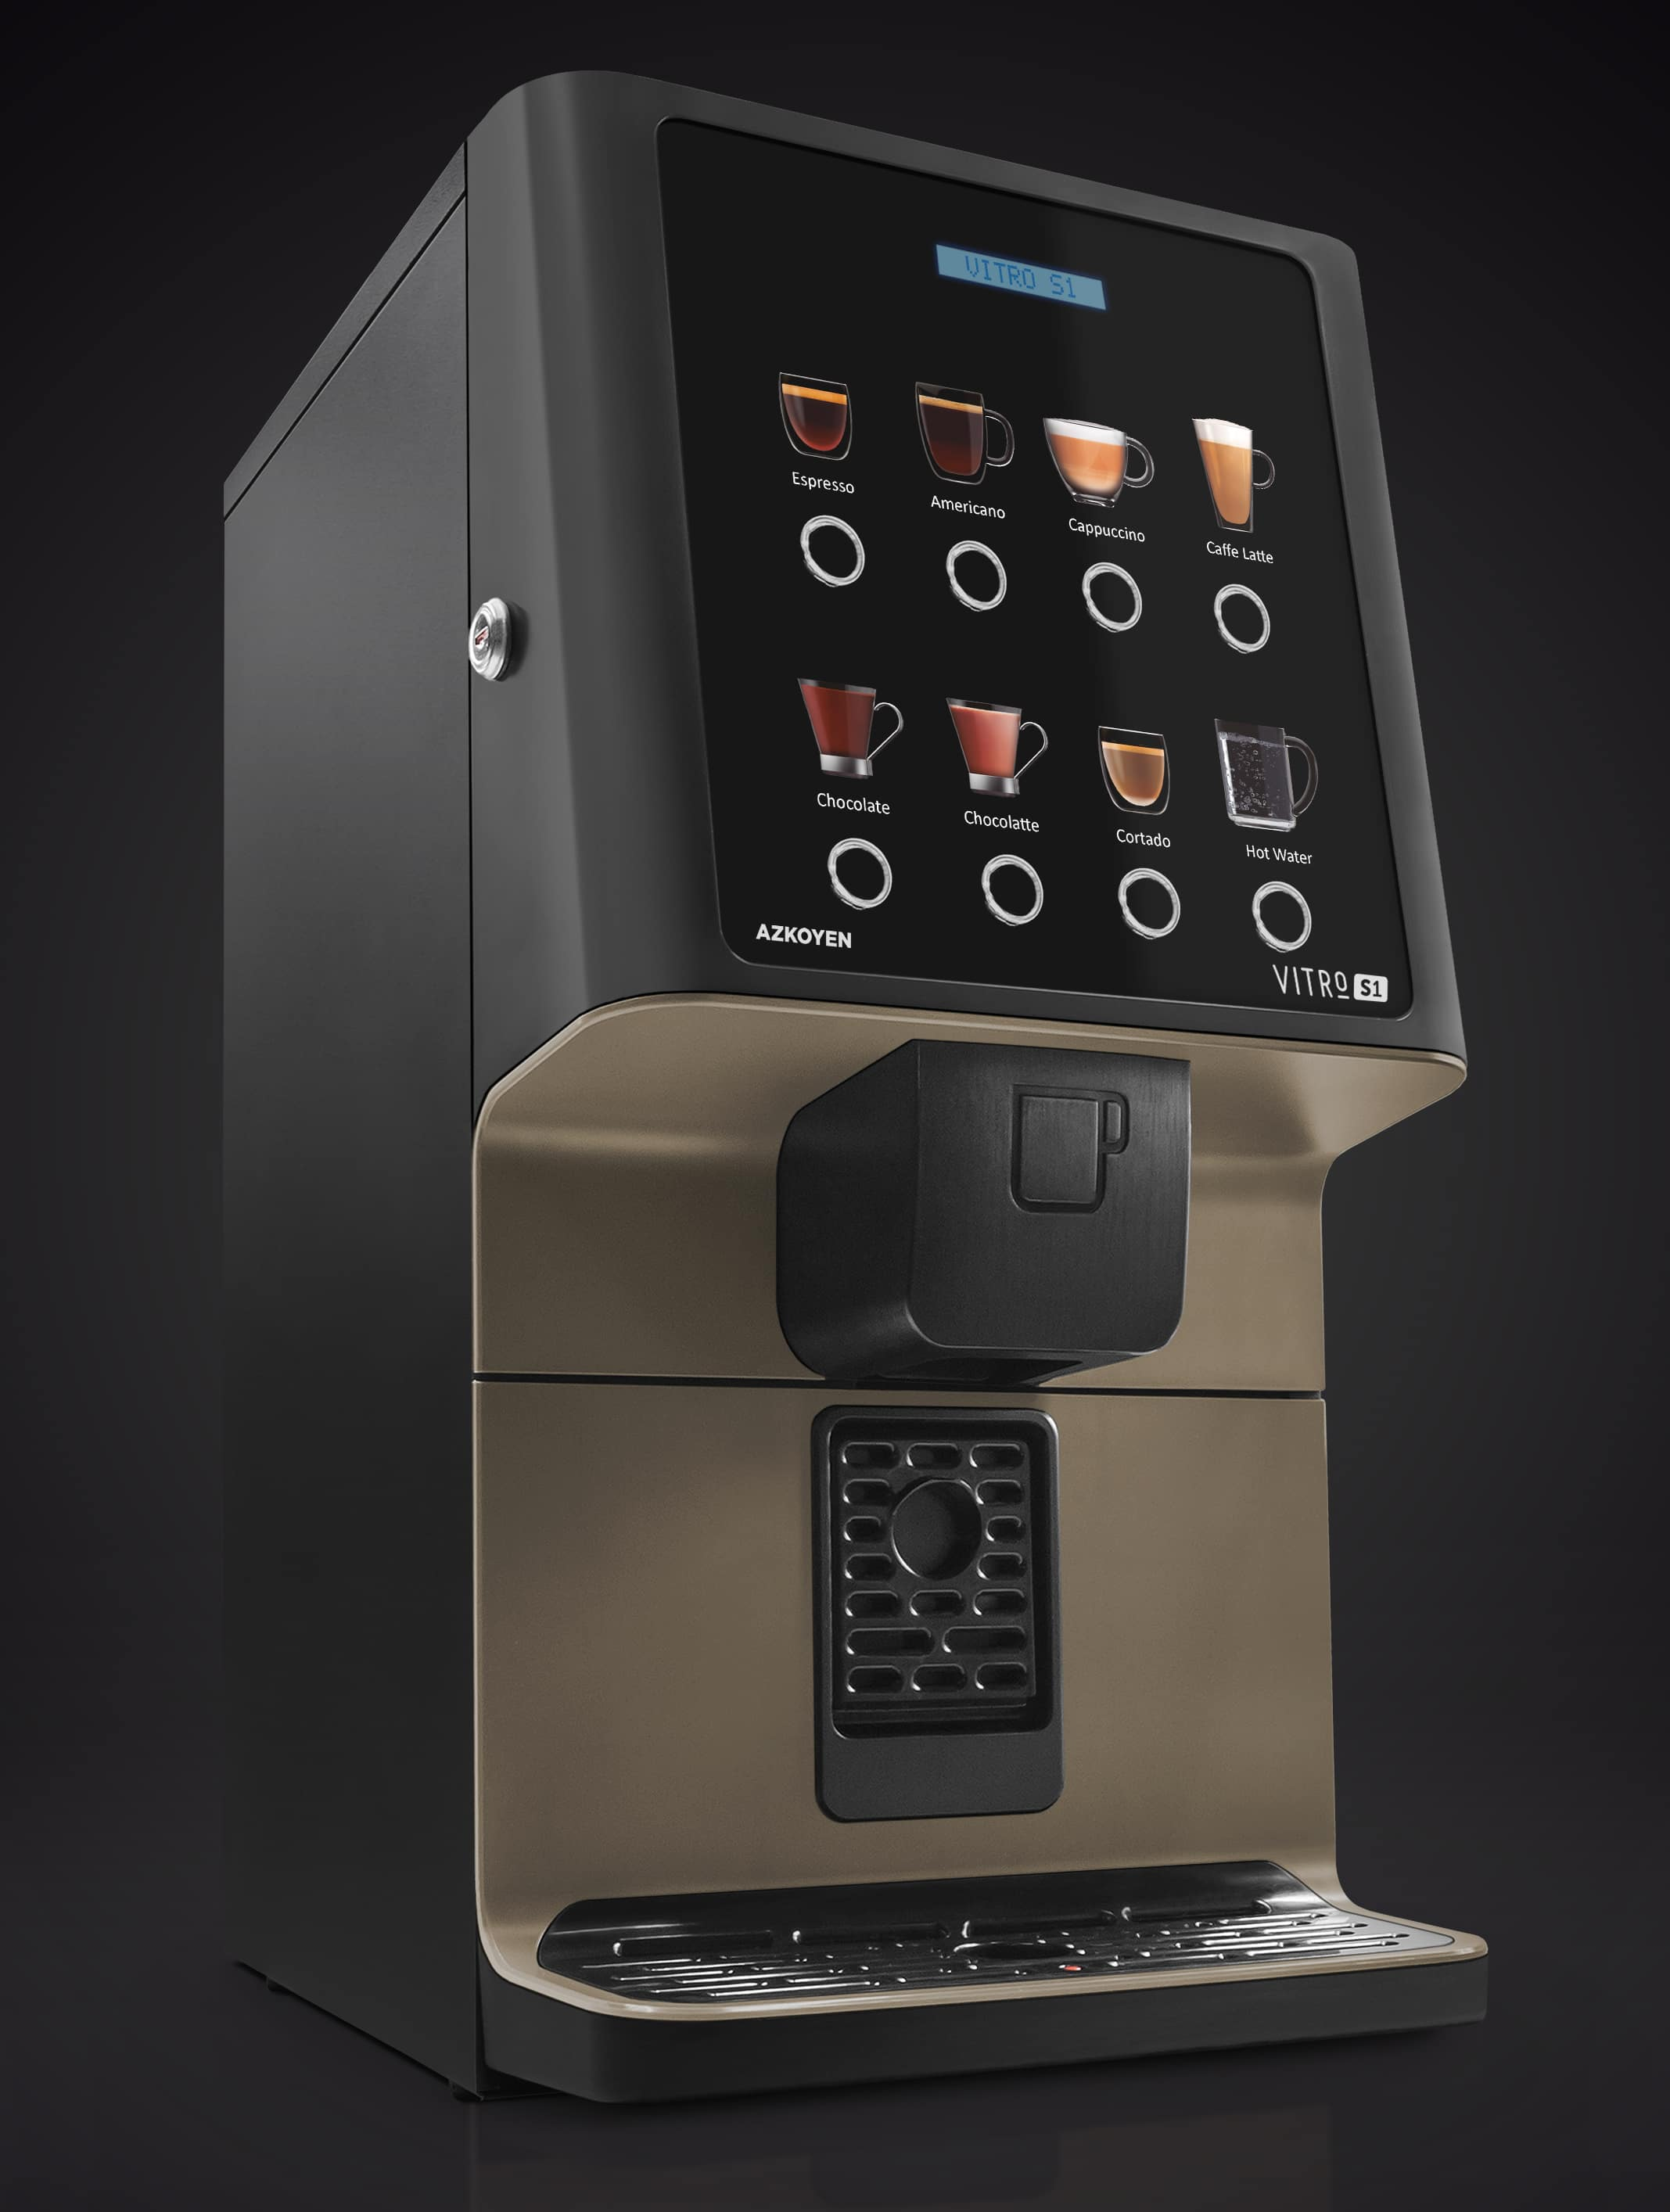 Azkoyen's Coffee Machine